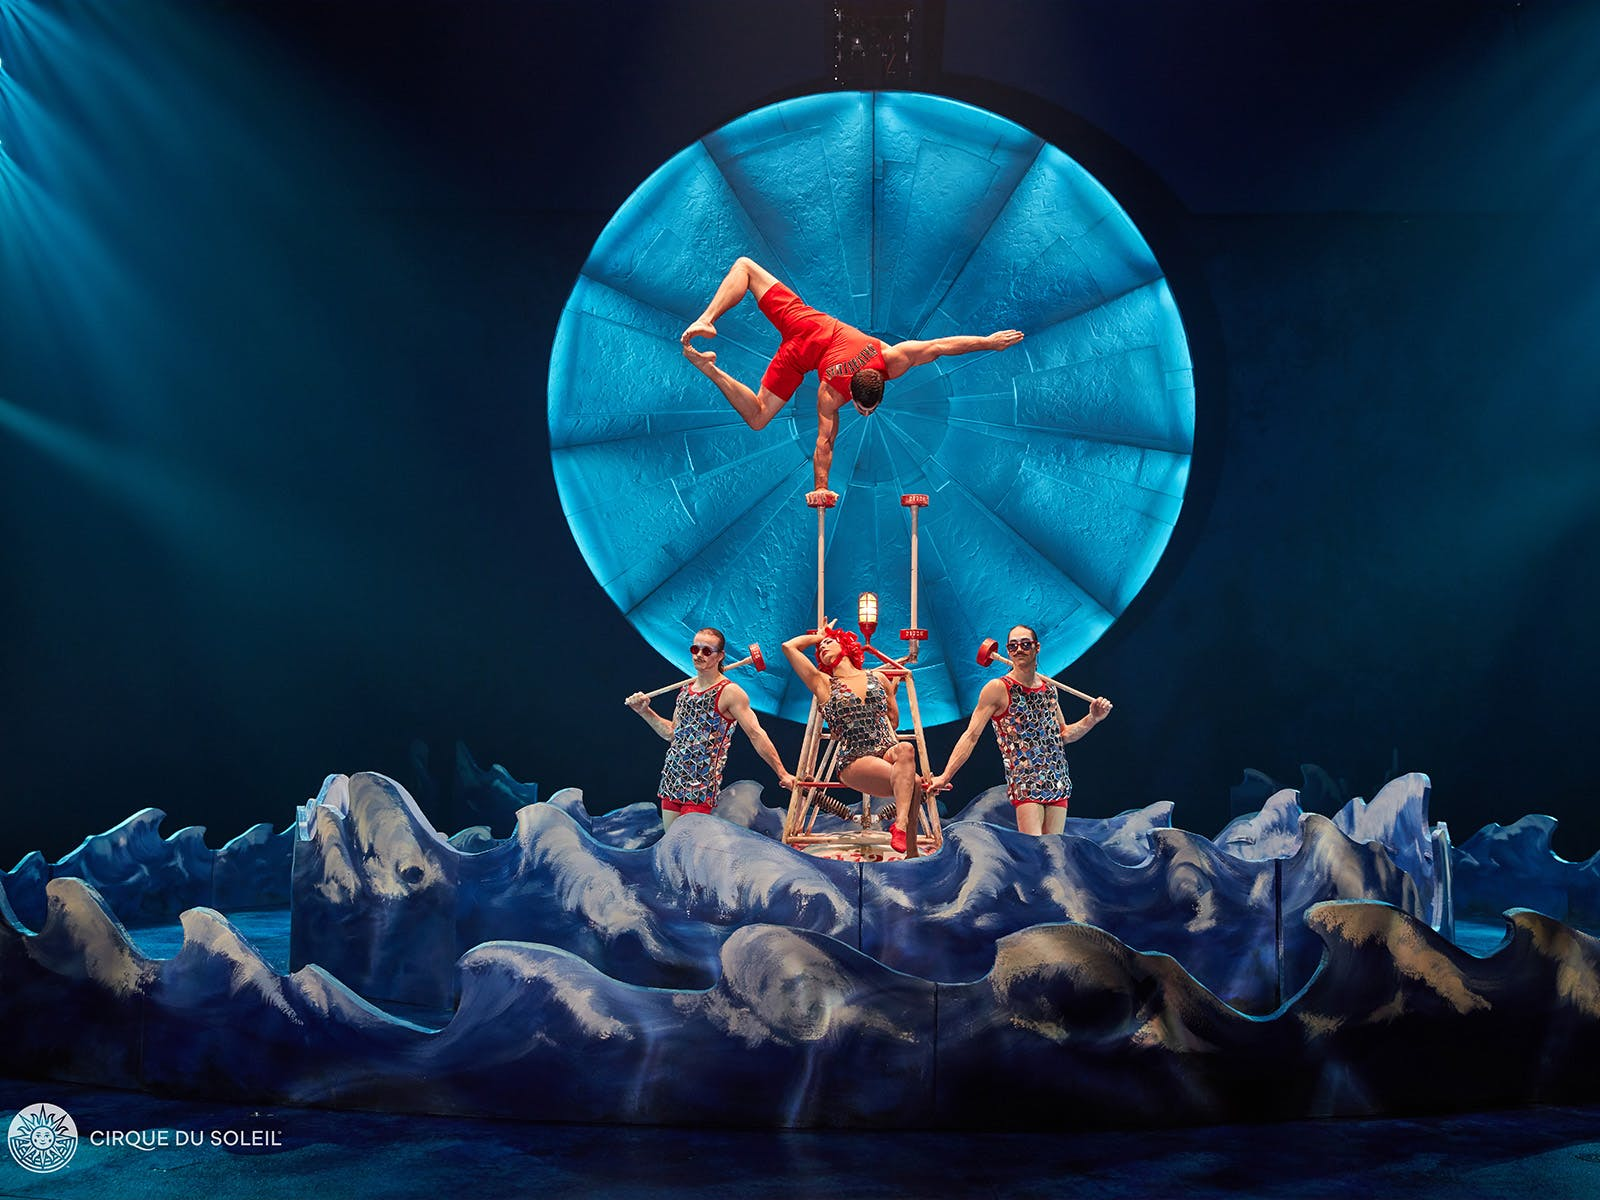 Cirque du Soleil - strategia błękitnego oceanu